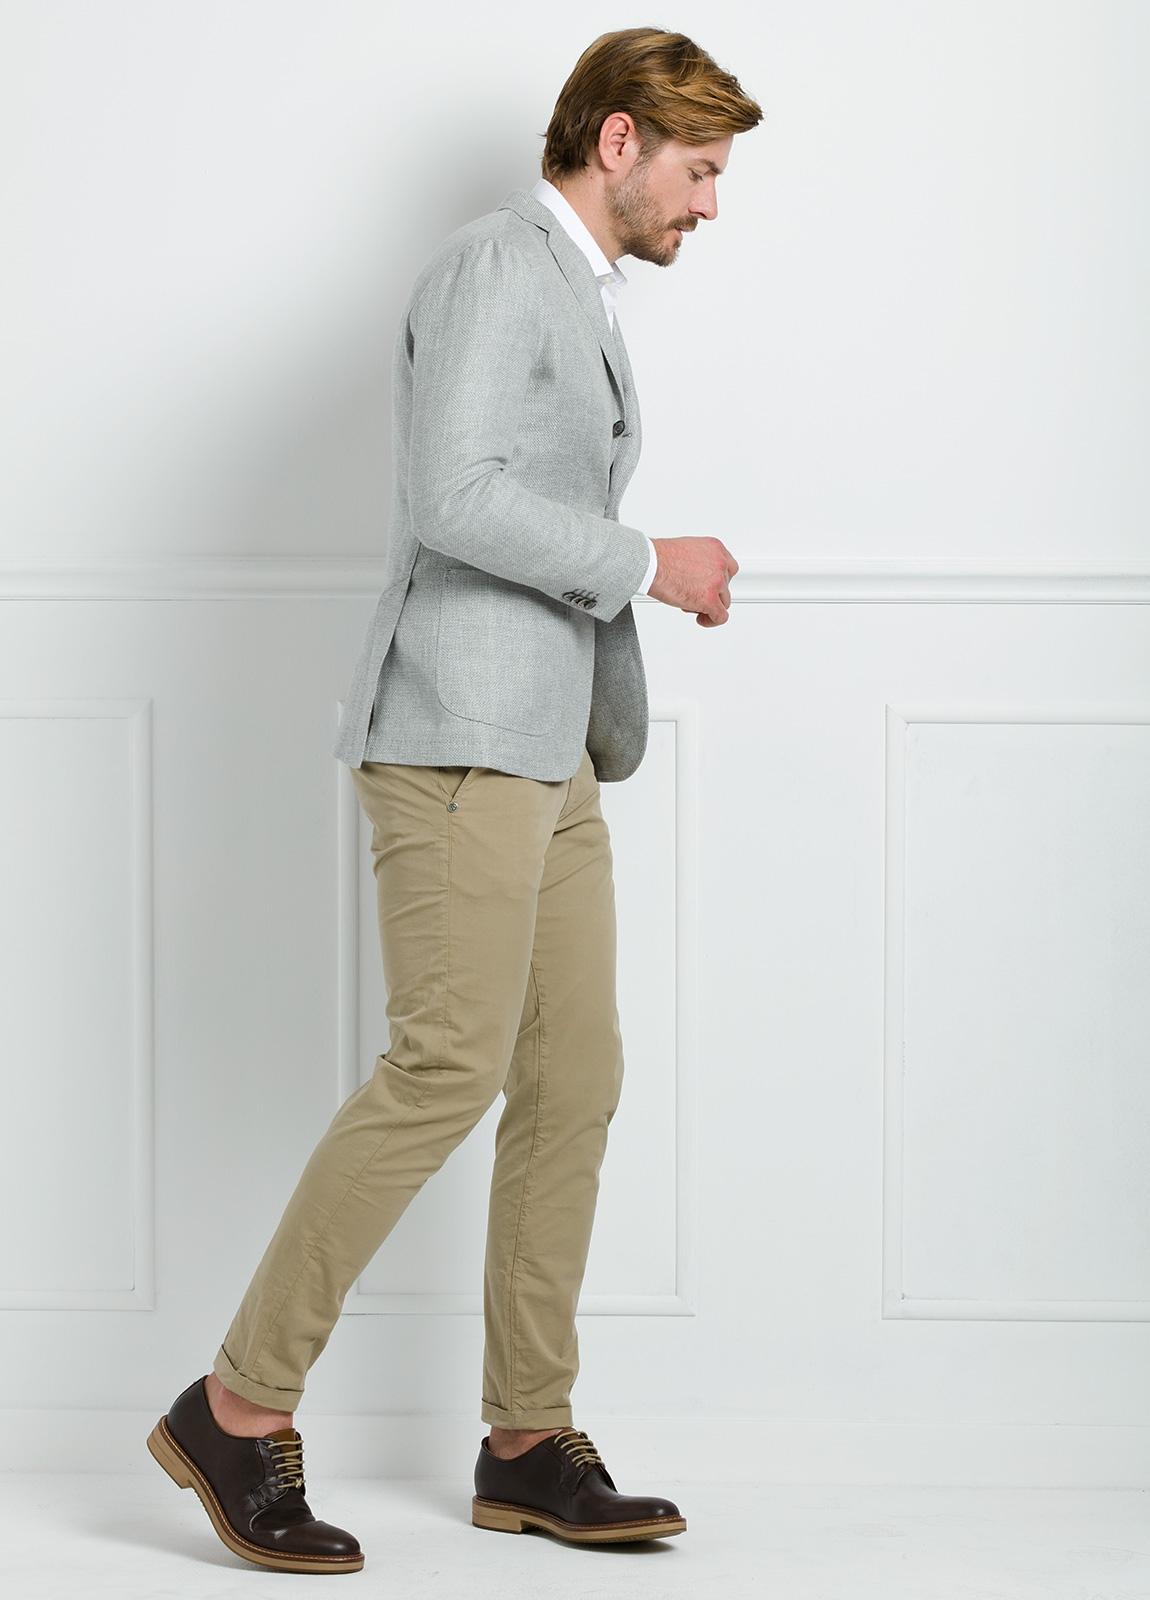 Americana SOFT JACKET Slim Fit textura color gris. 75% Cáñamo 25% lana. - Ítem1